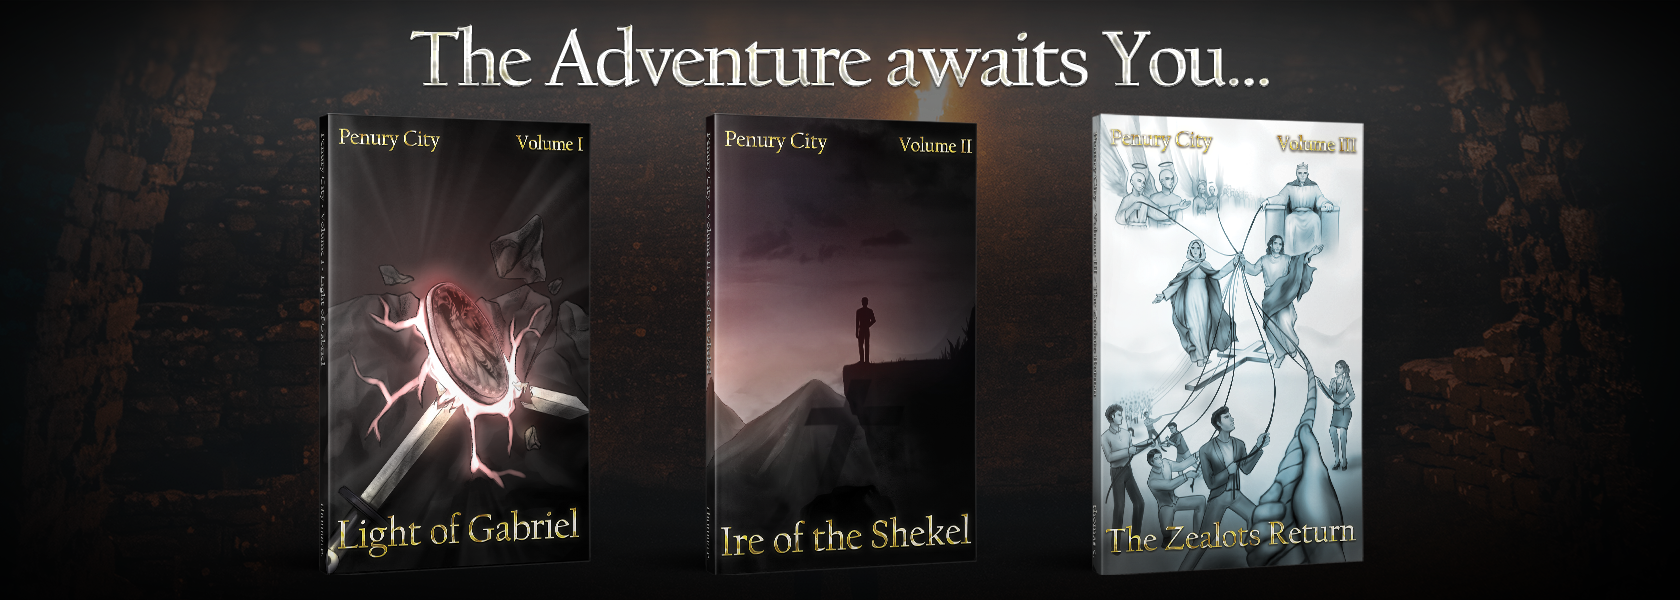 Penury City: The Adventure awaits you